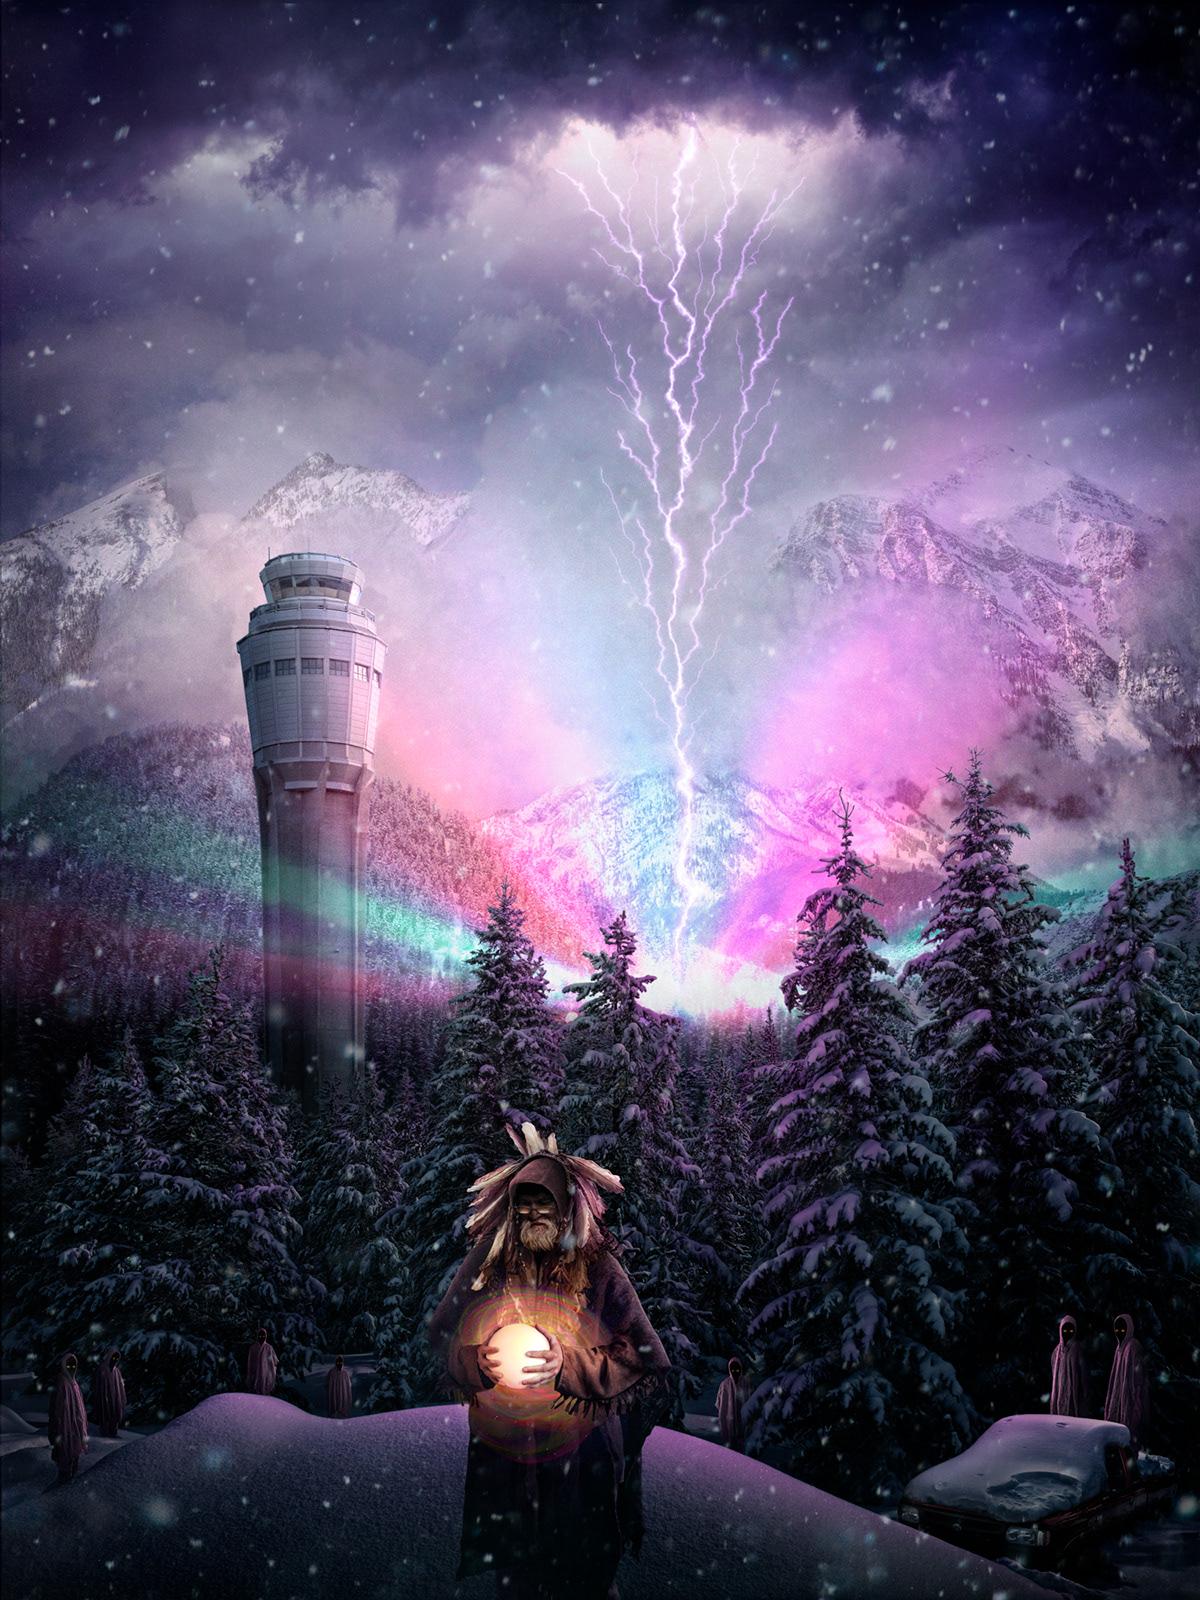 white human  Nick Pedersen science fiction Sci Fi lightning future Arctic winter inspire alien post-apocalyptic photoshop photomanipulation photoillustration